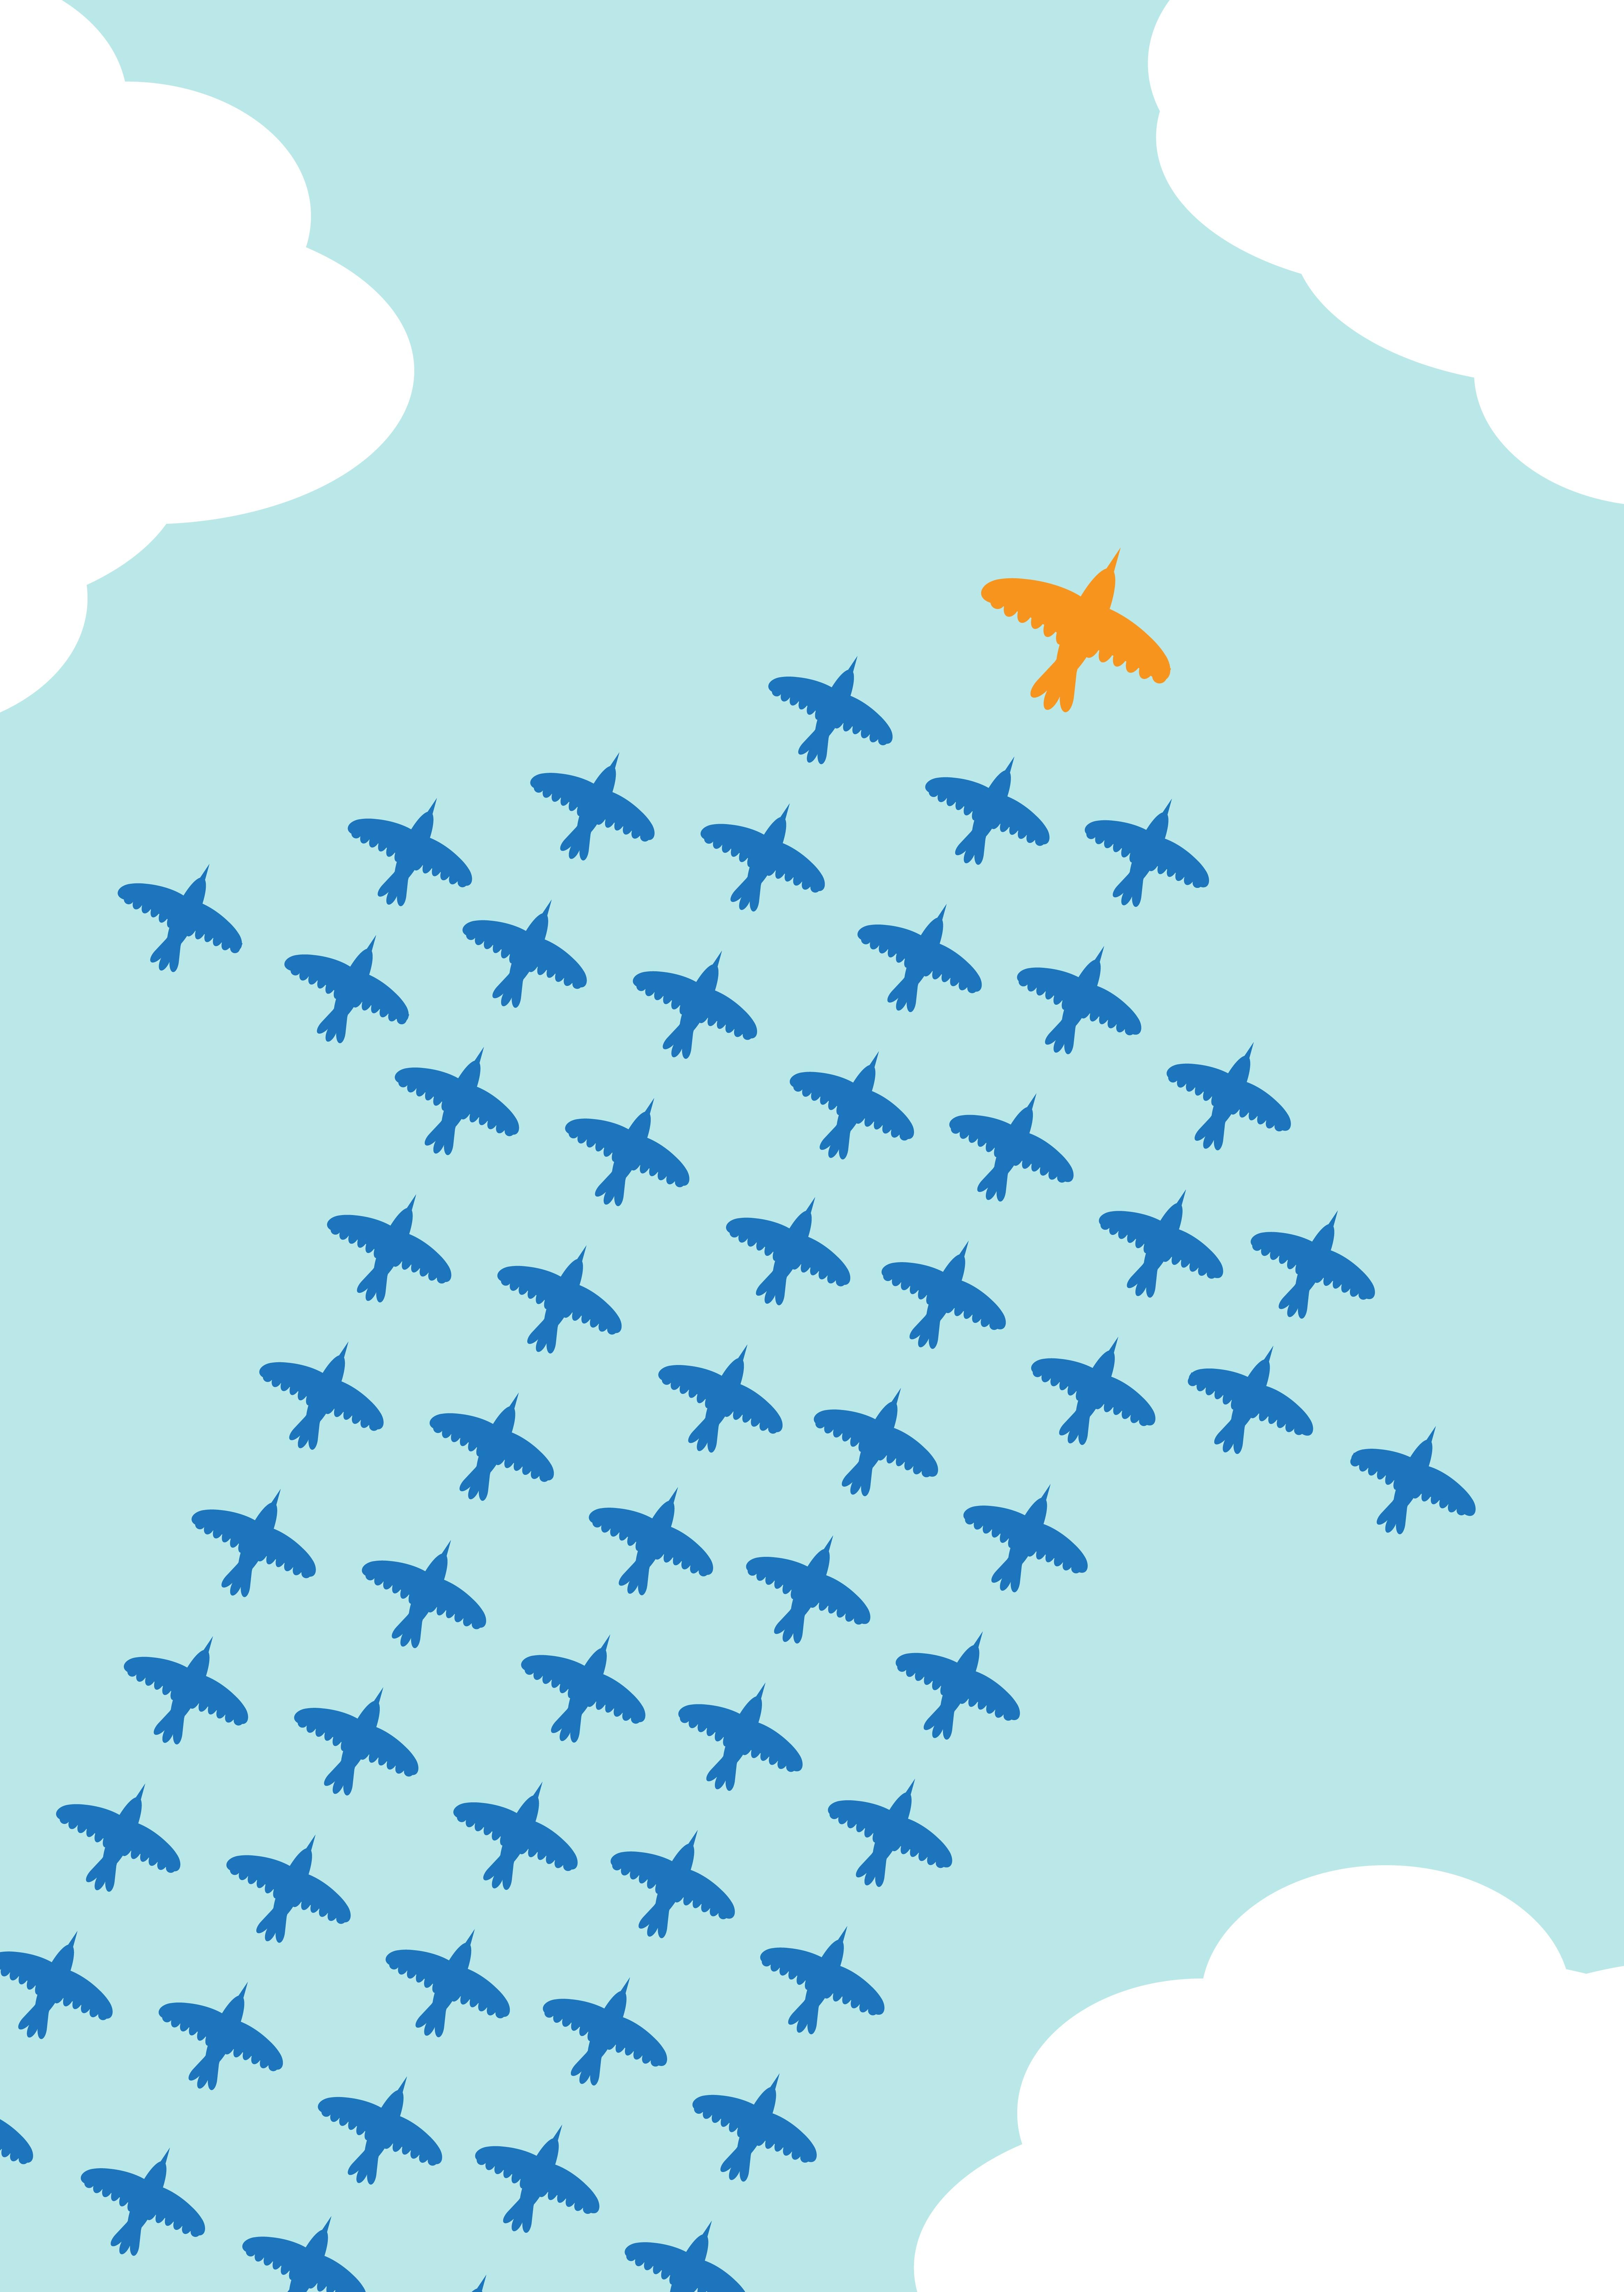 Leadership_birds_207217240.jpg